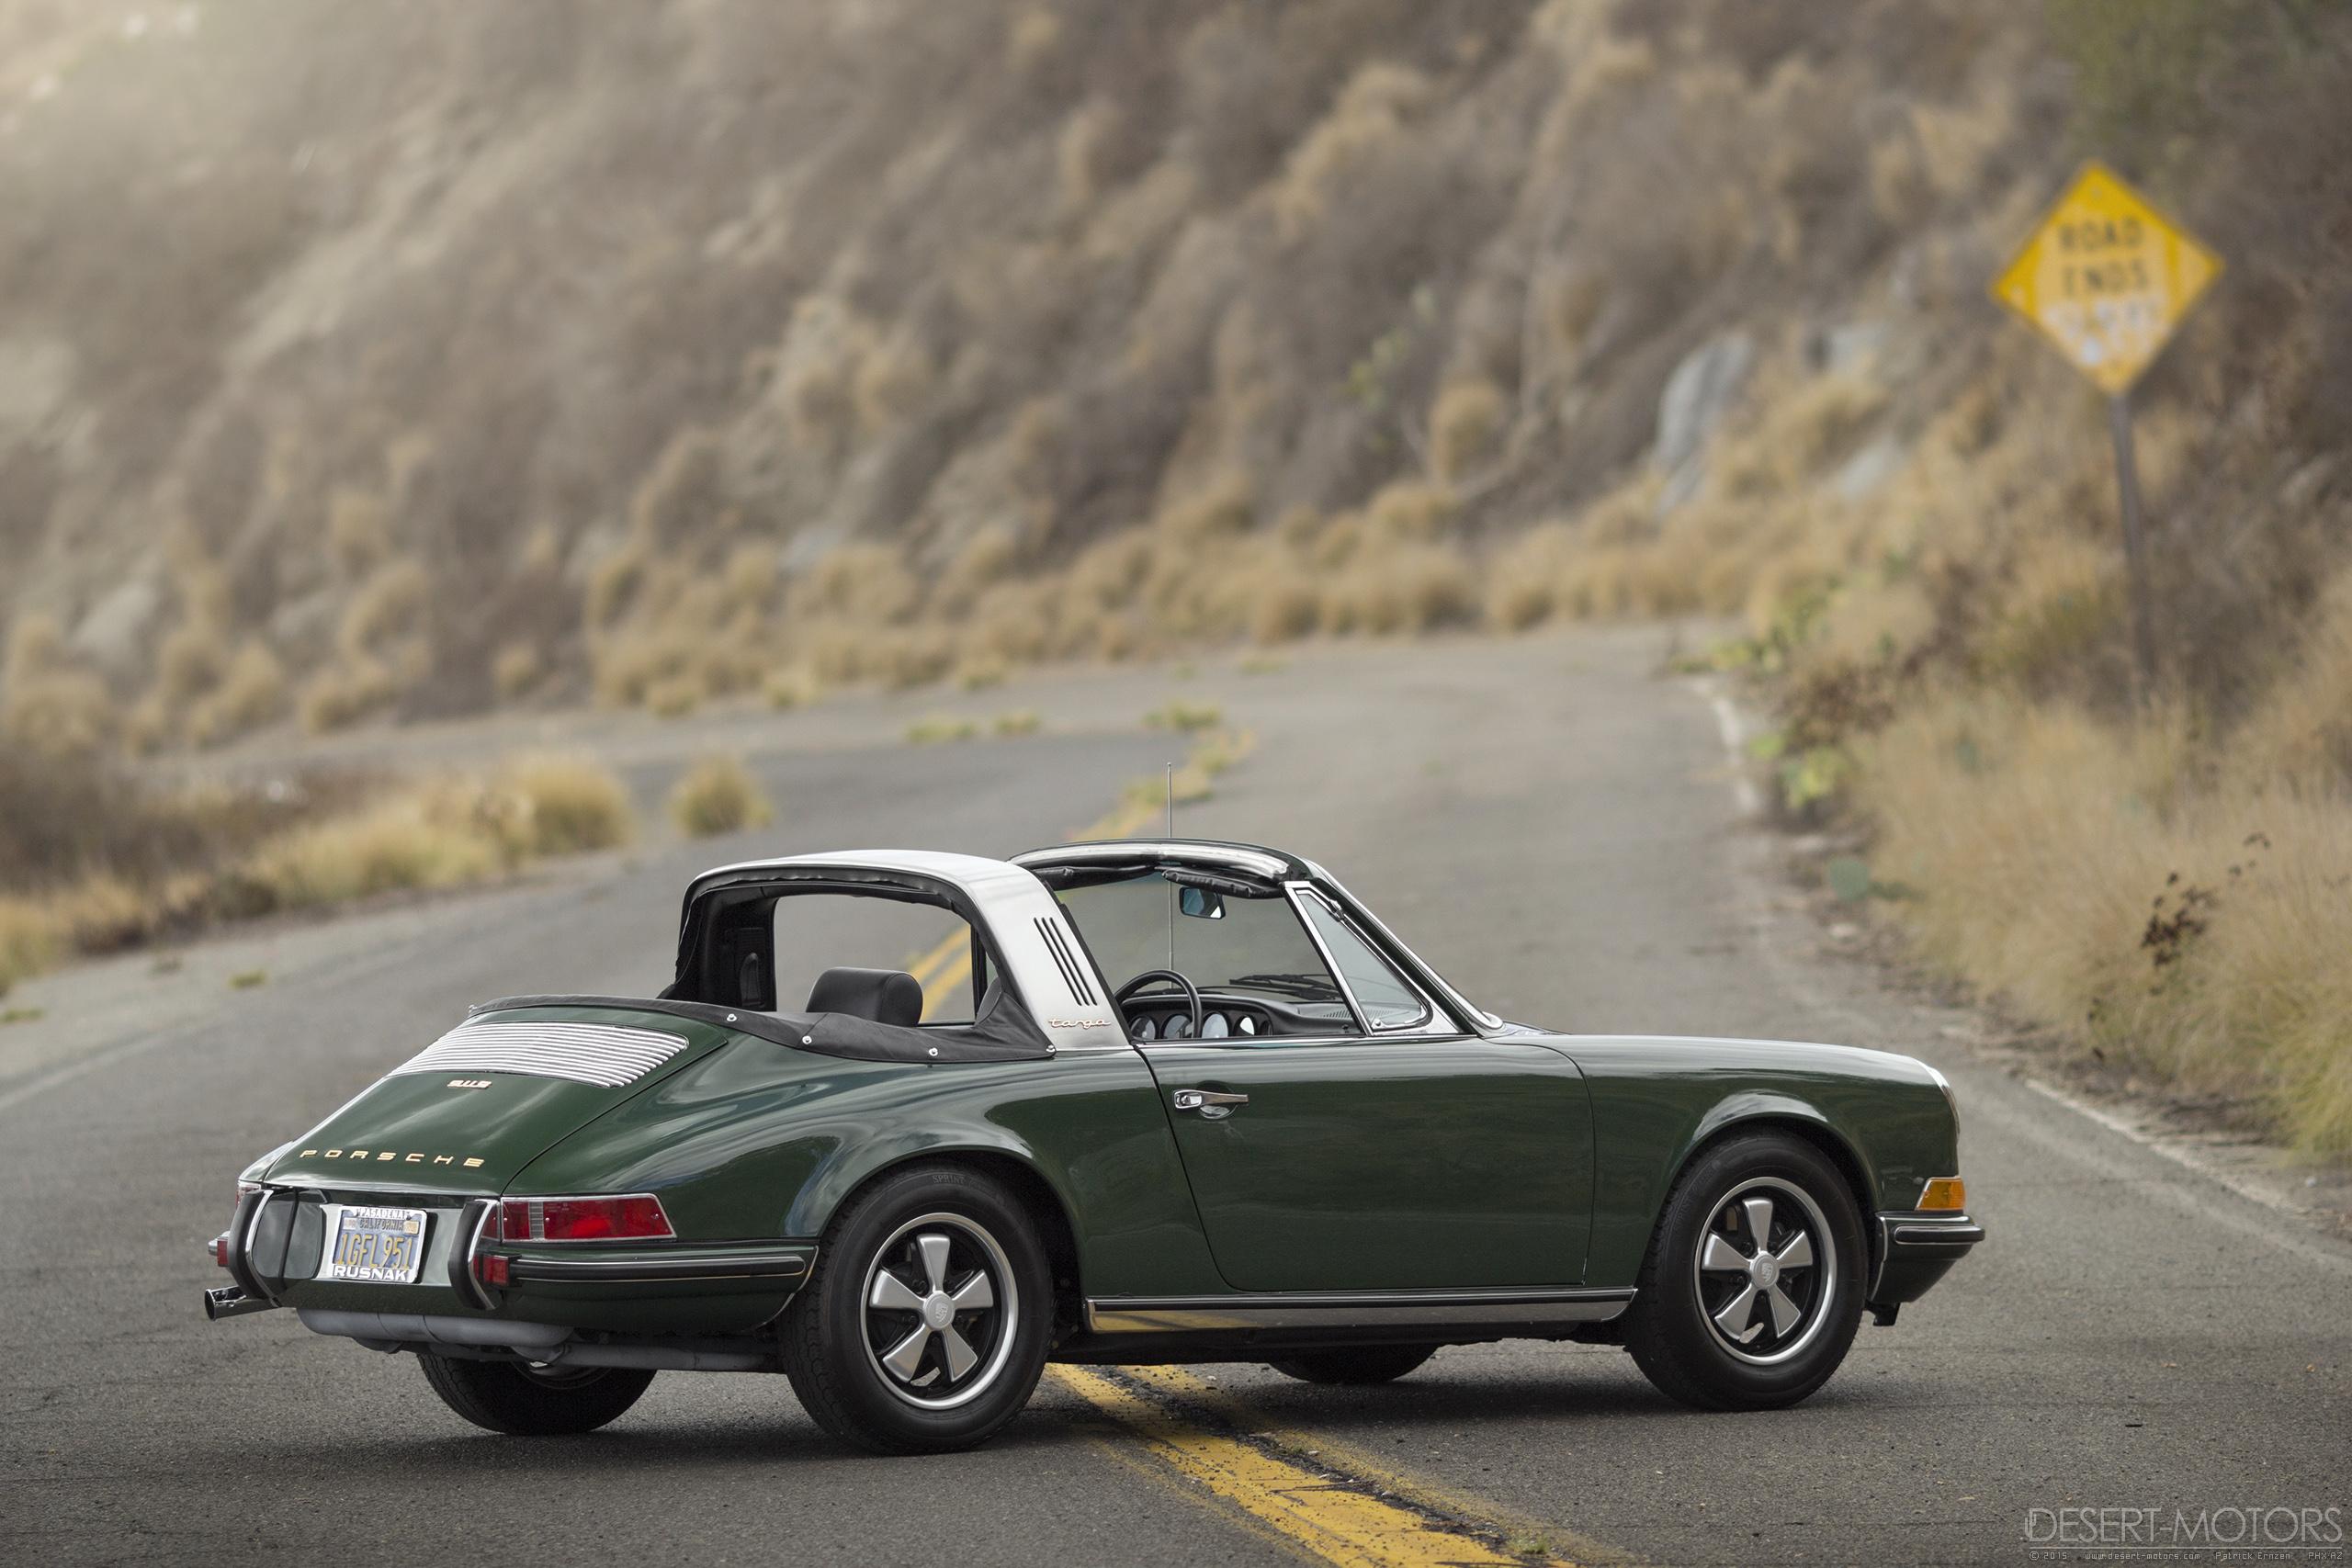 1969 Porsche 911 S Soft Window Targa Desert Motors Com